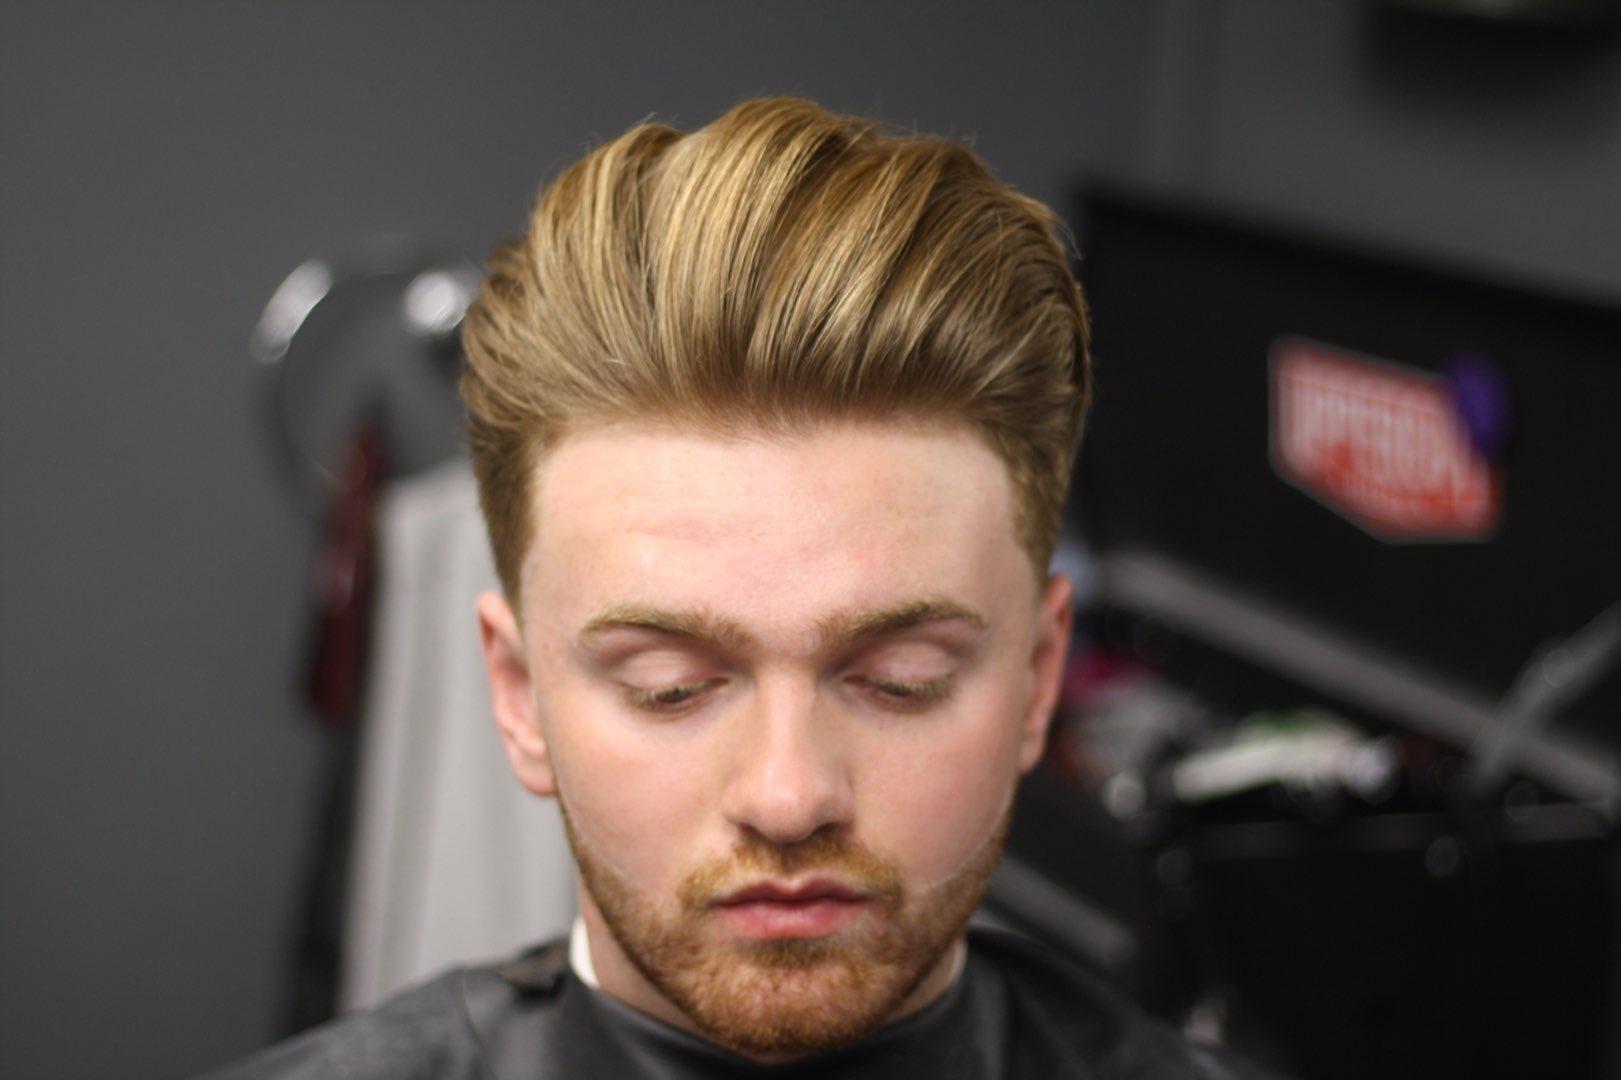 Barber Shop - WHITSON BARBERS